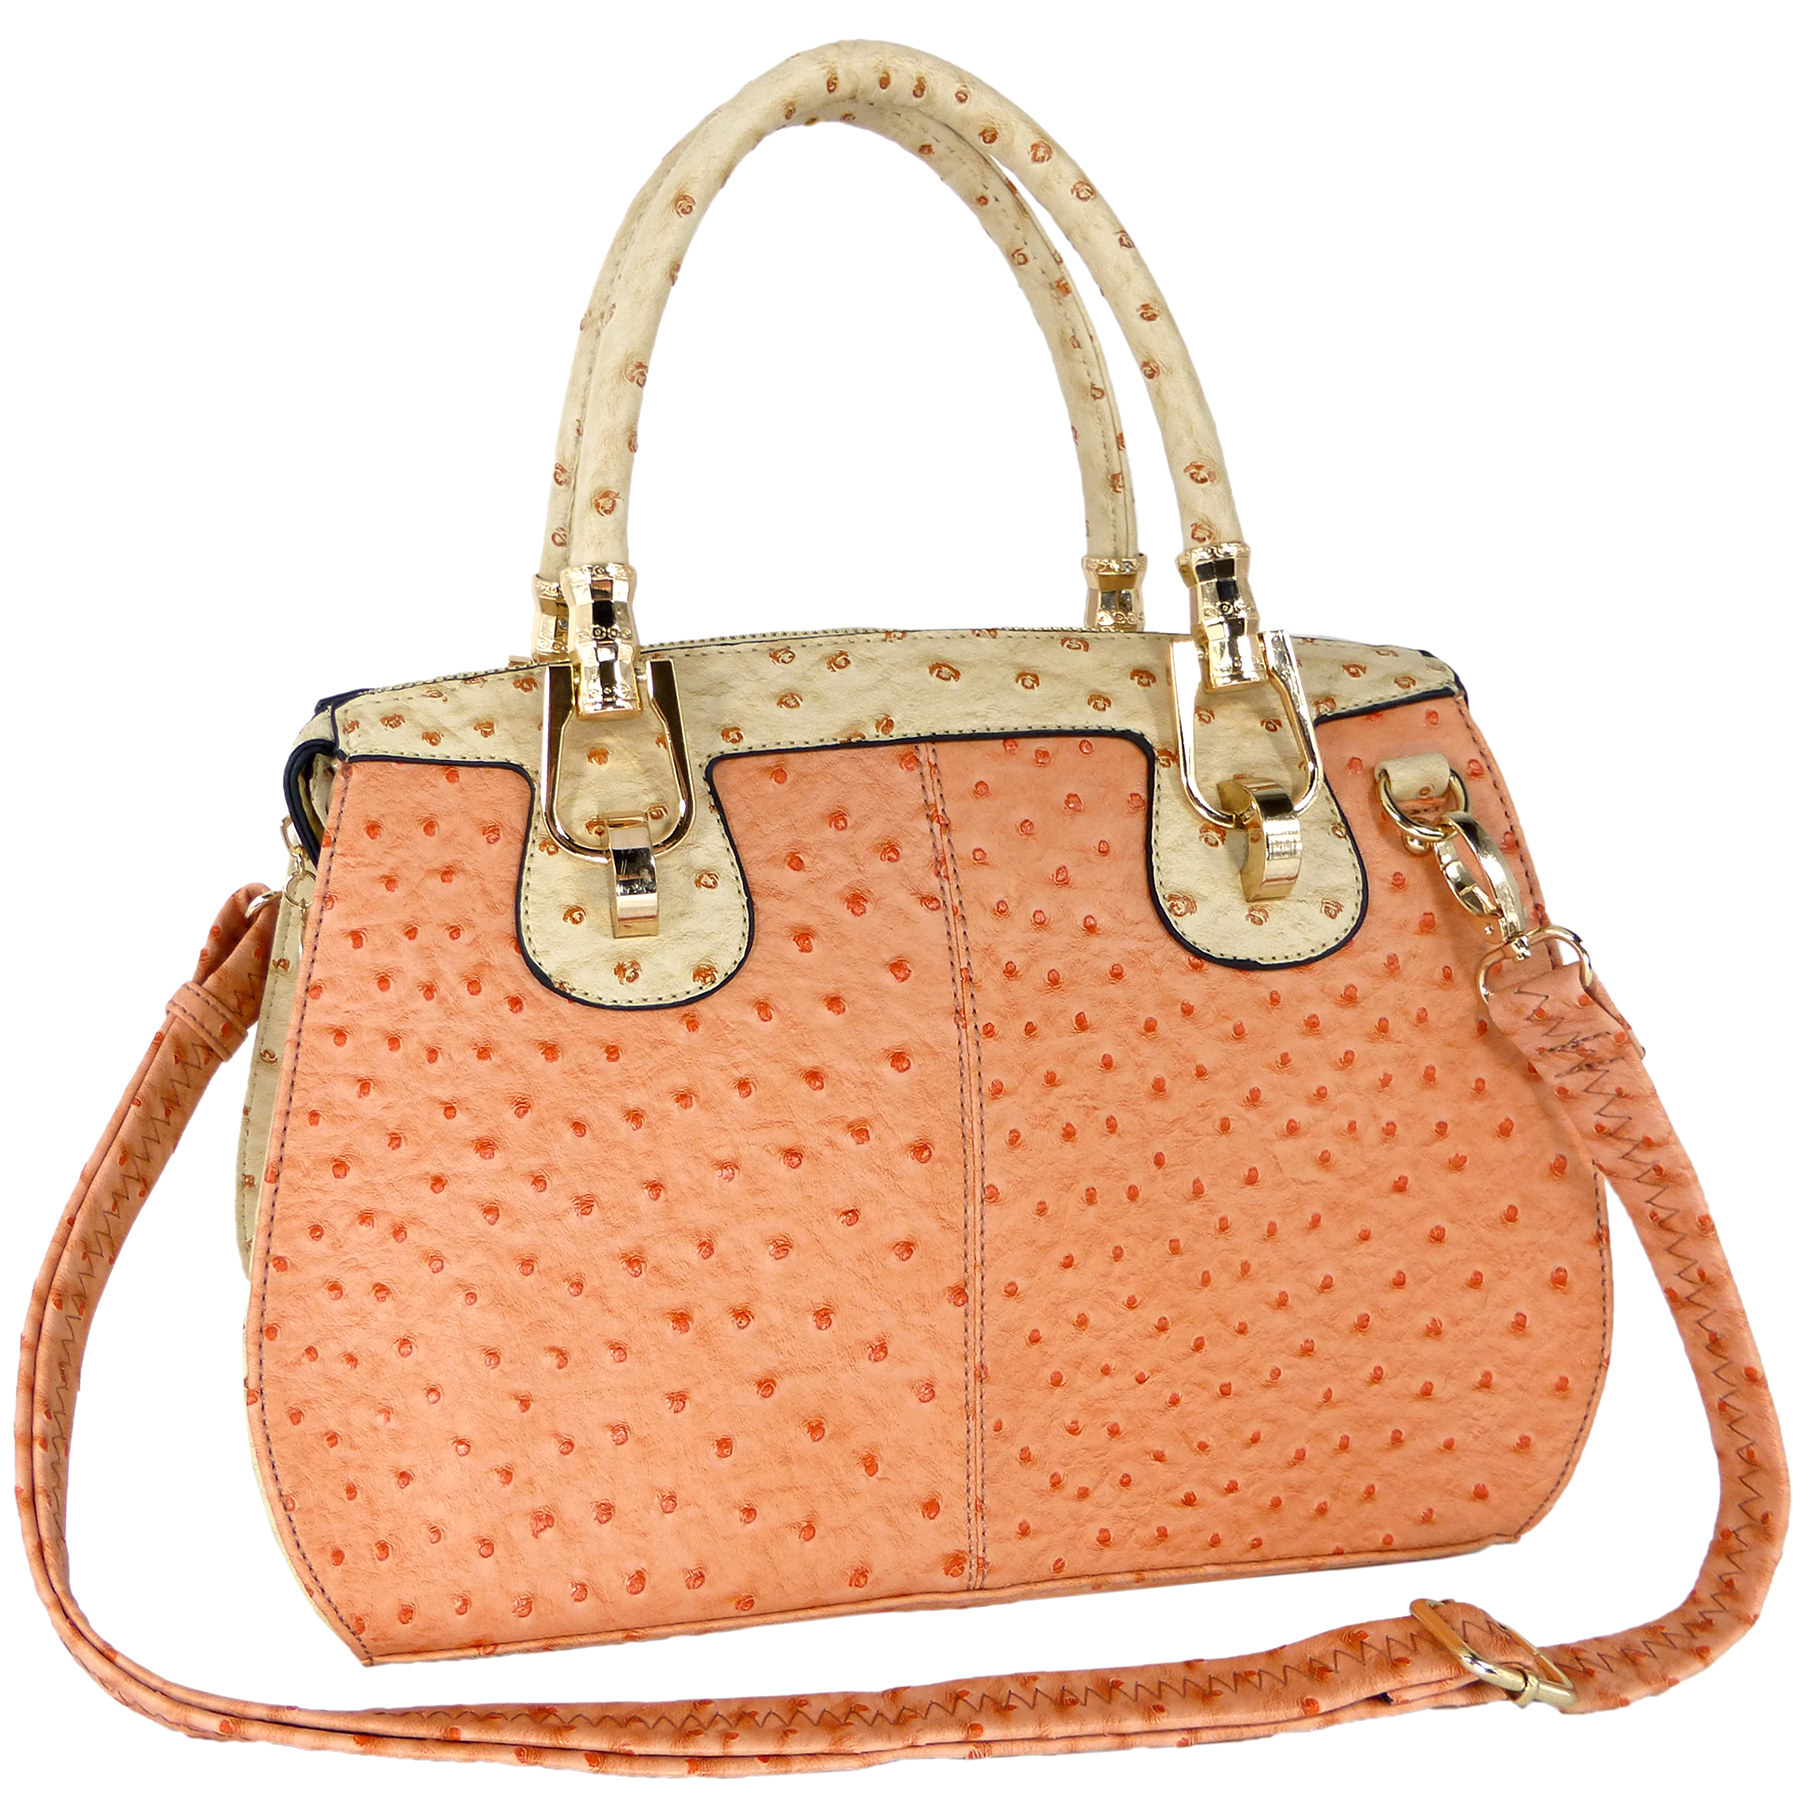 MARISSA Pink Doctor Style Handbag Main